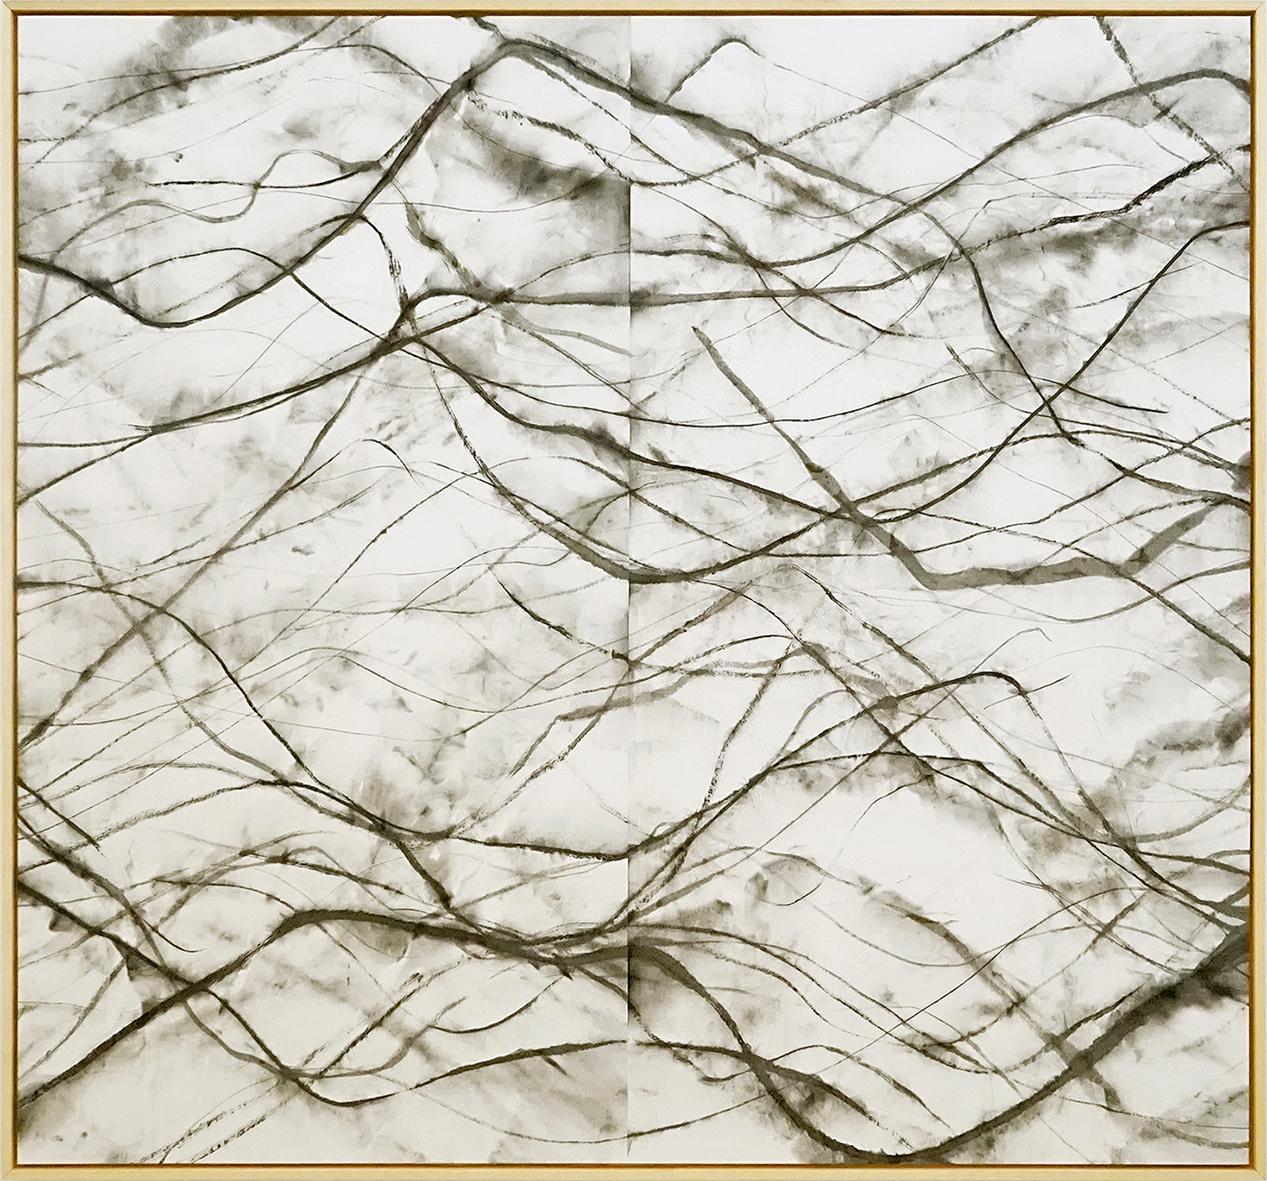 Zhou Jianjun 周建军, Untitled 无题, 2015, Ink on paper 纸本水墨设色, 184 x 197 cm